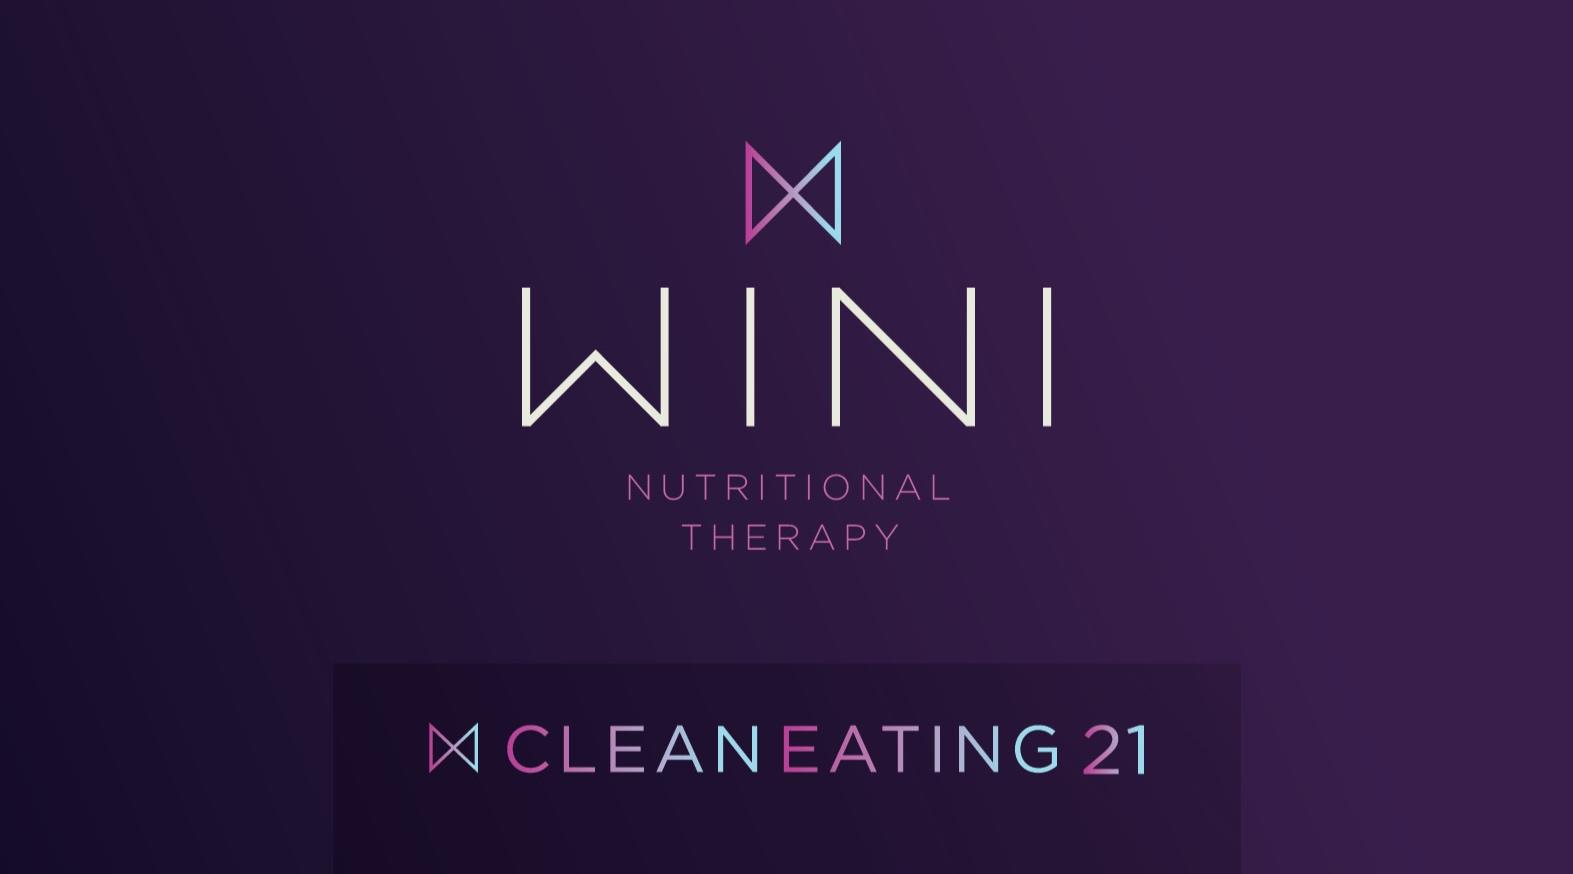 WINI_clean_eTING_banner.jpg